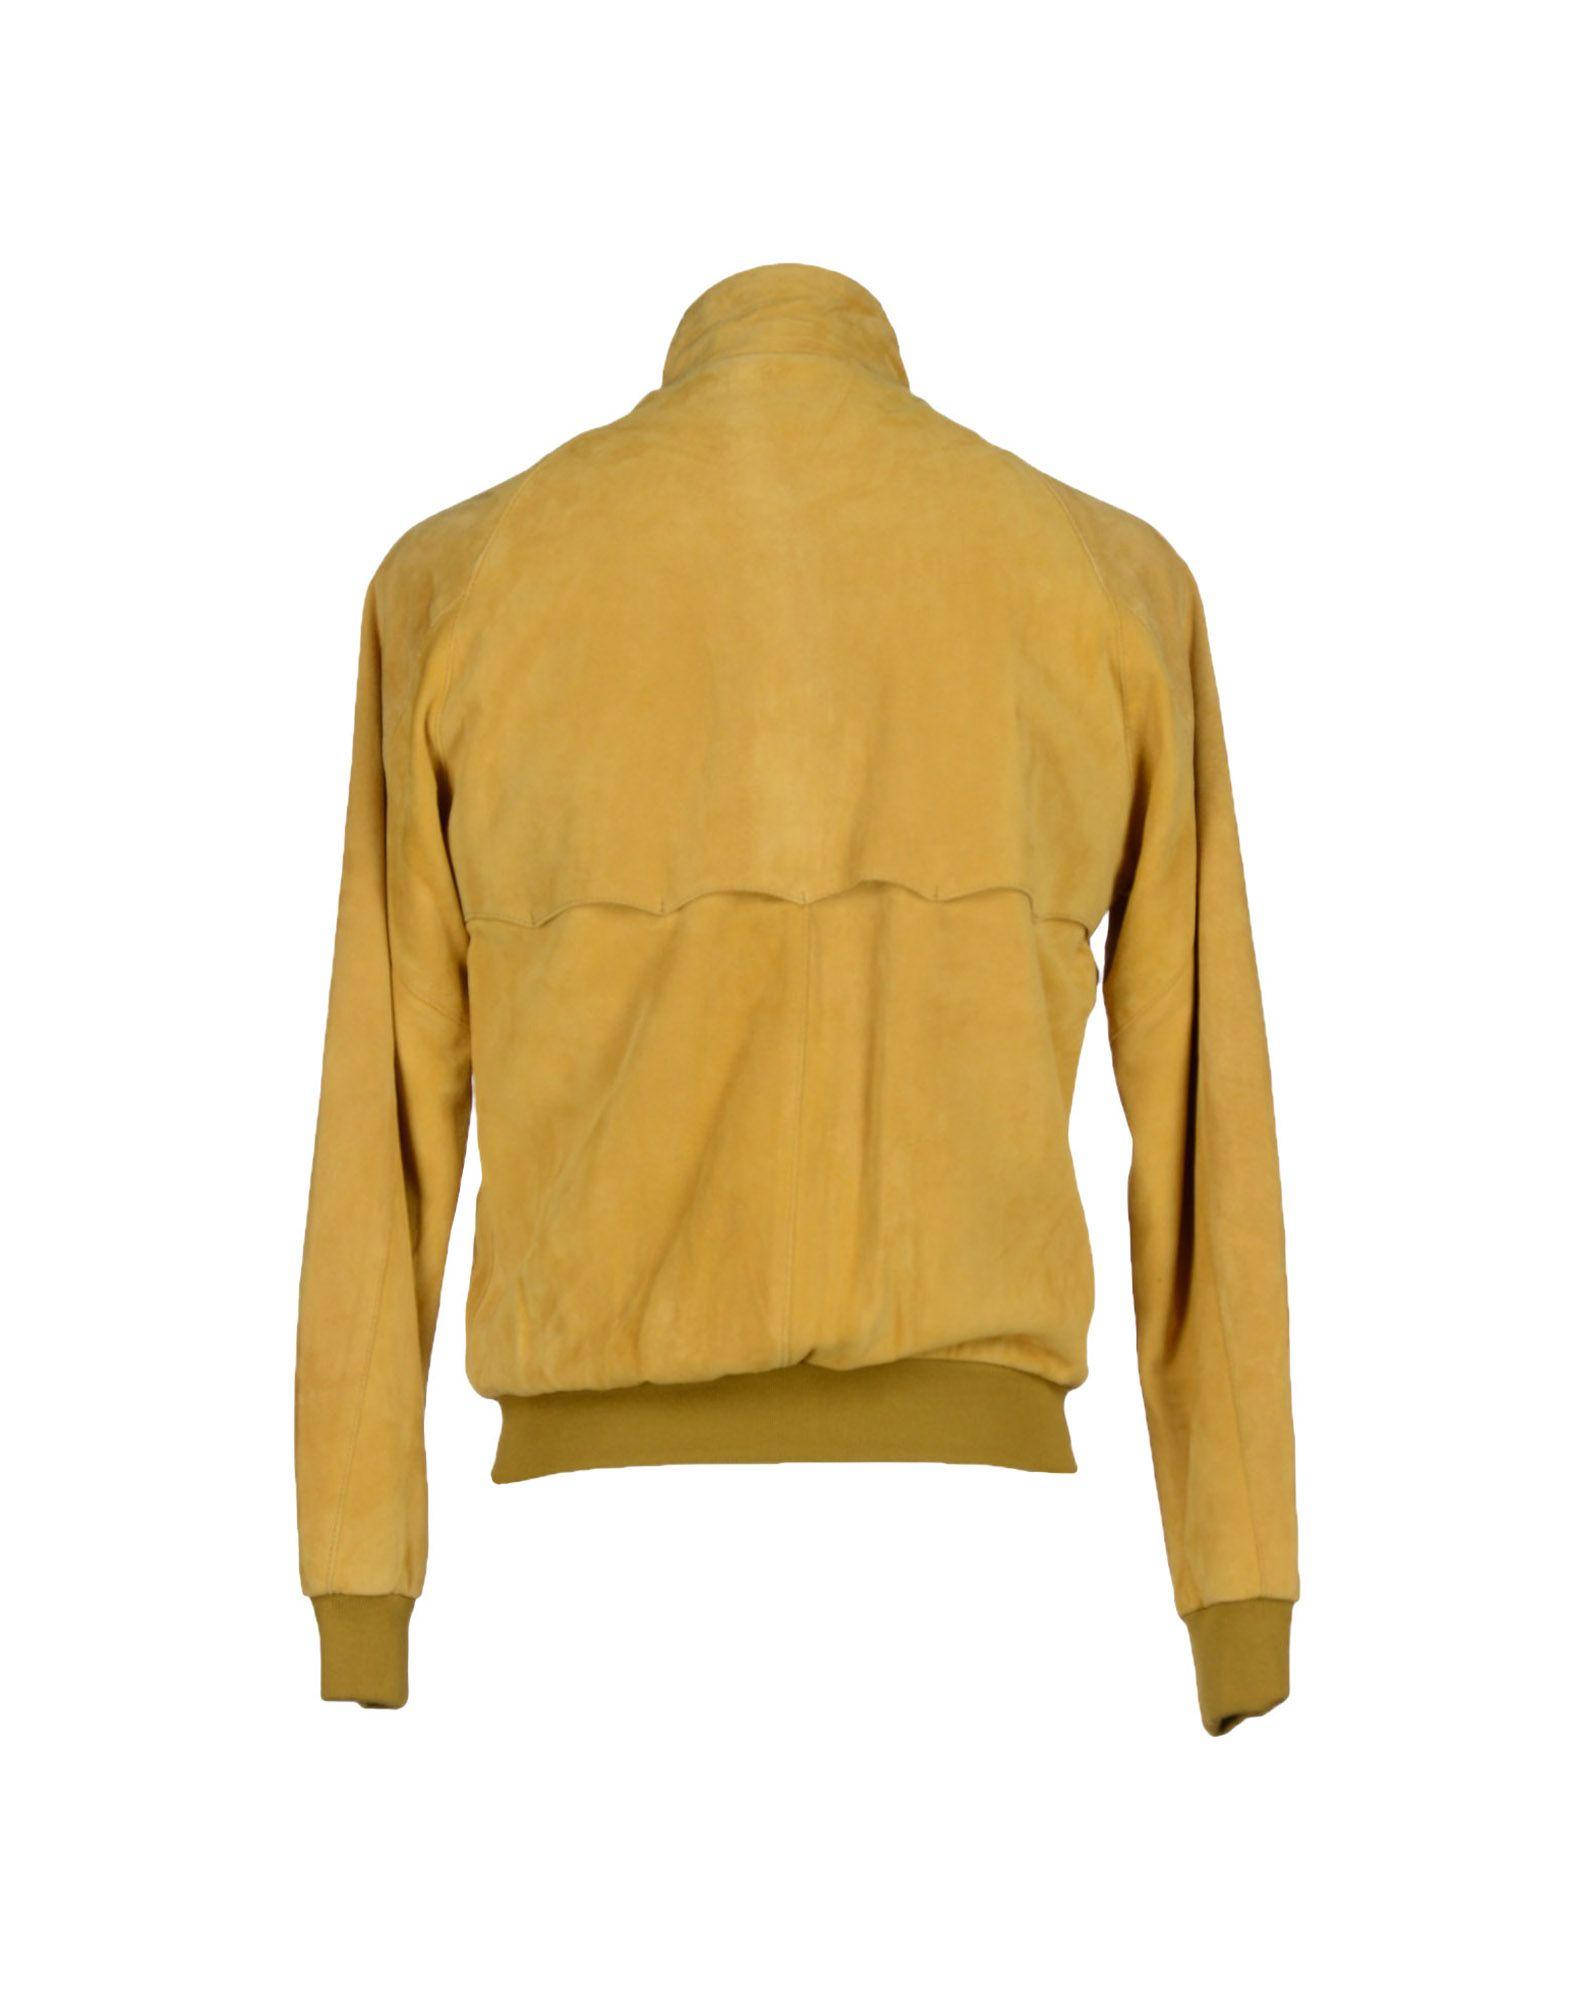 single men in yellow jacket Explore edward stanjo's board men's fashion: yellow on yellow jacket for this winter men's seine mens fashion street styles yellow color hardcore single piece.